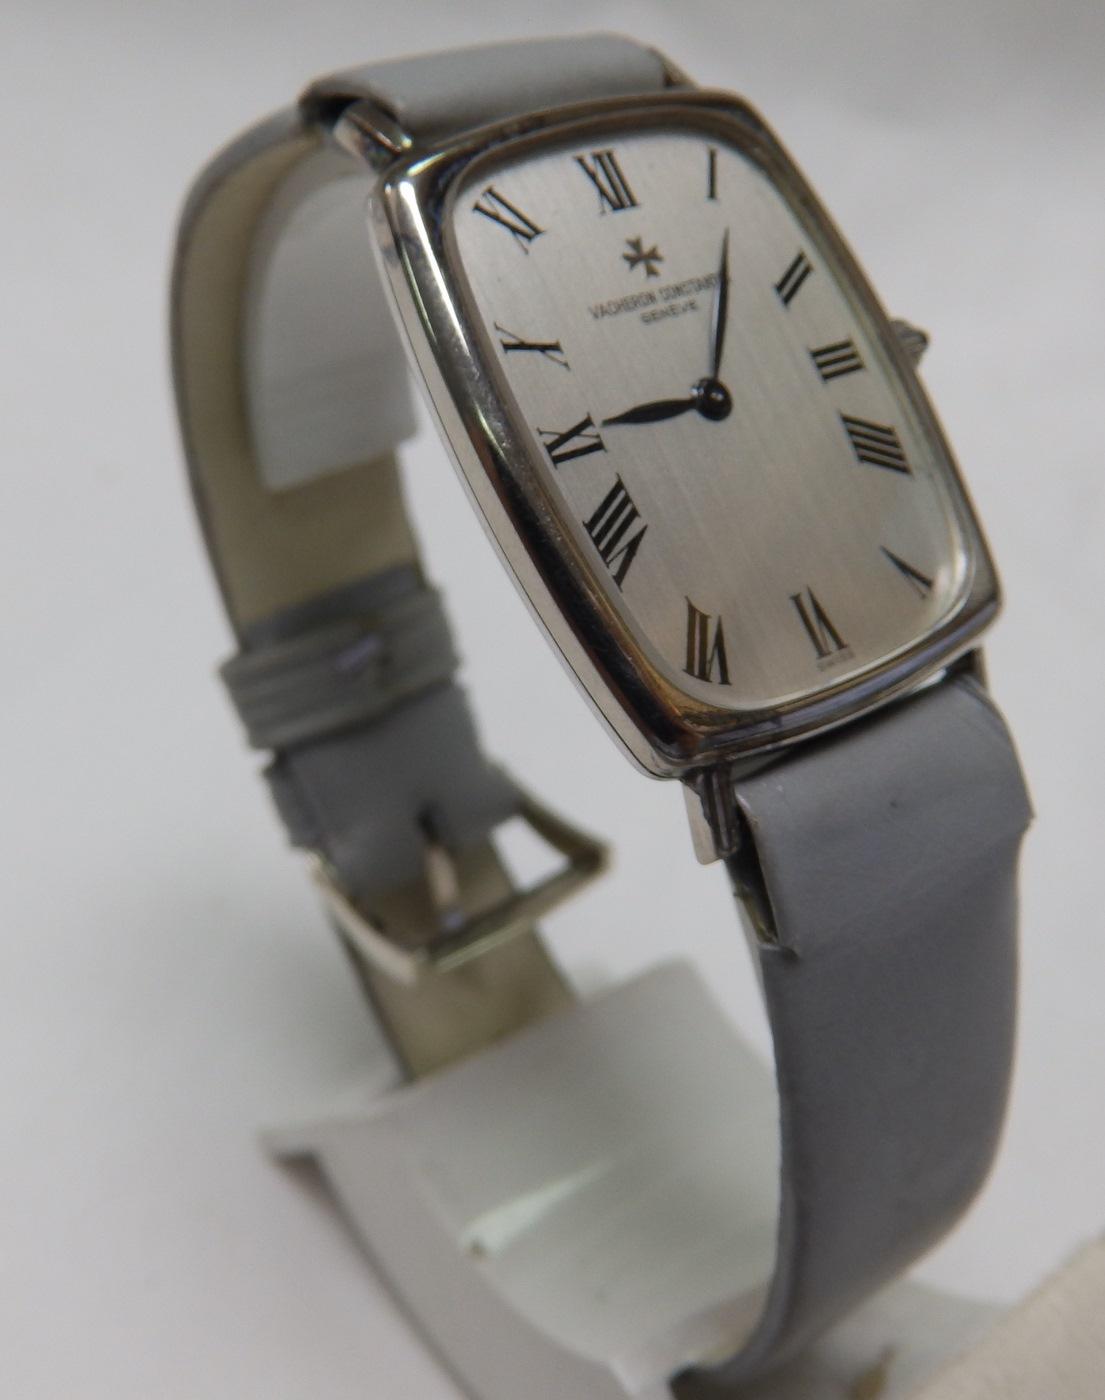 Vacheron Constantin. Reloj de Pulsera de caballero. Ca. 1955